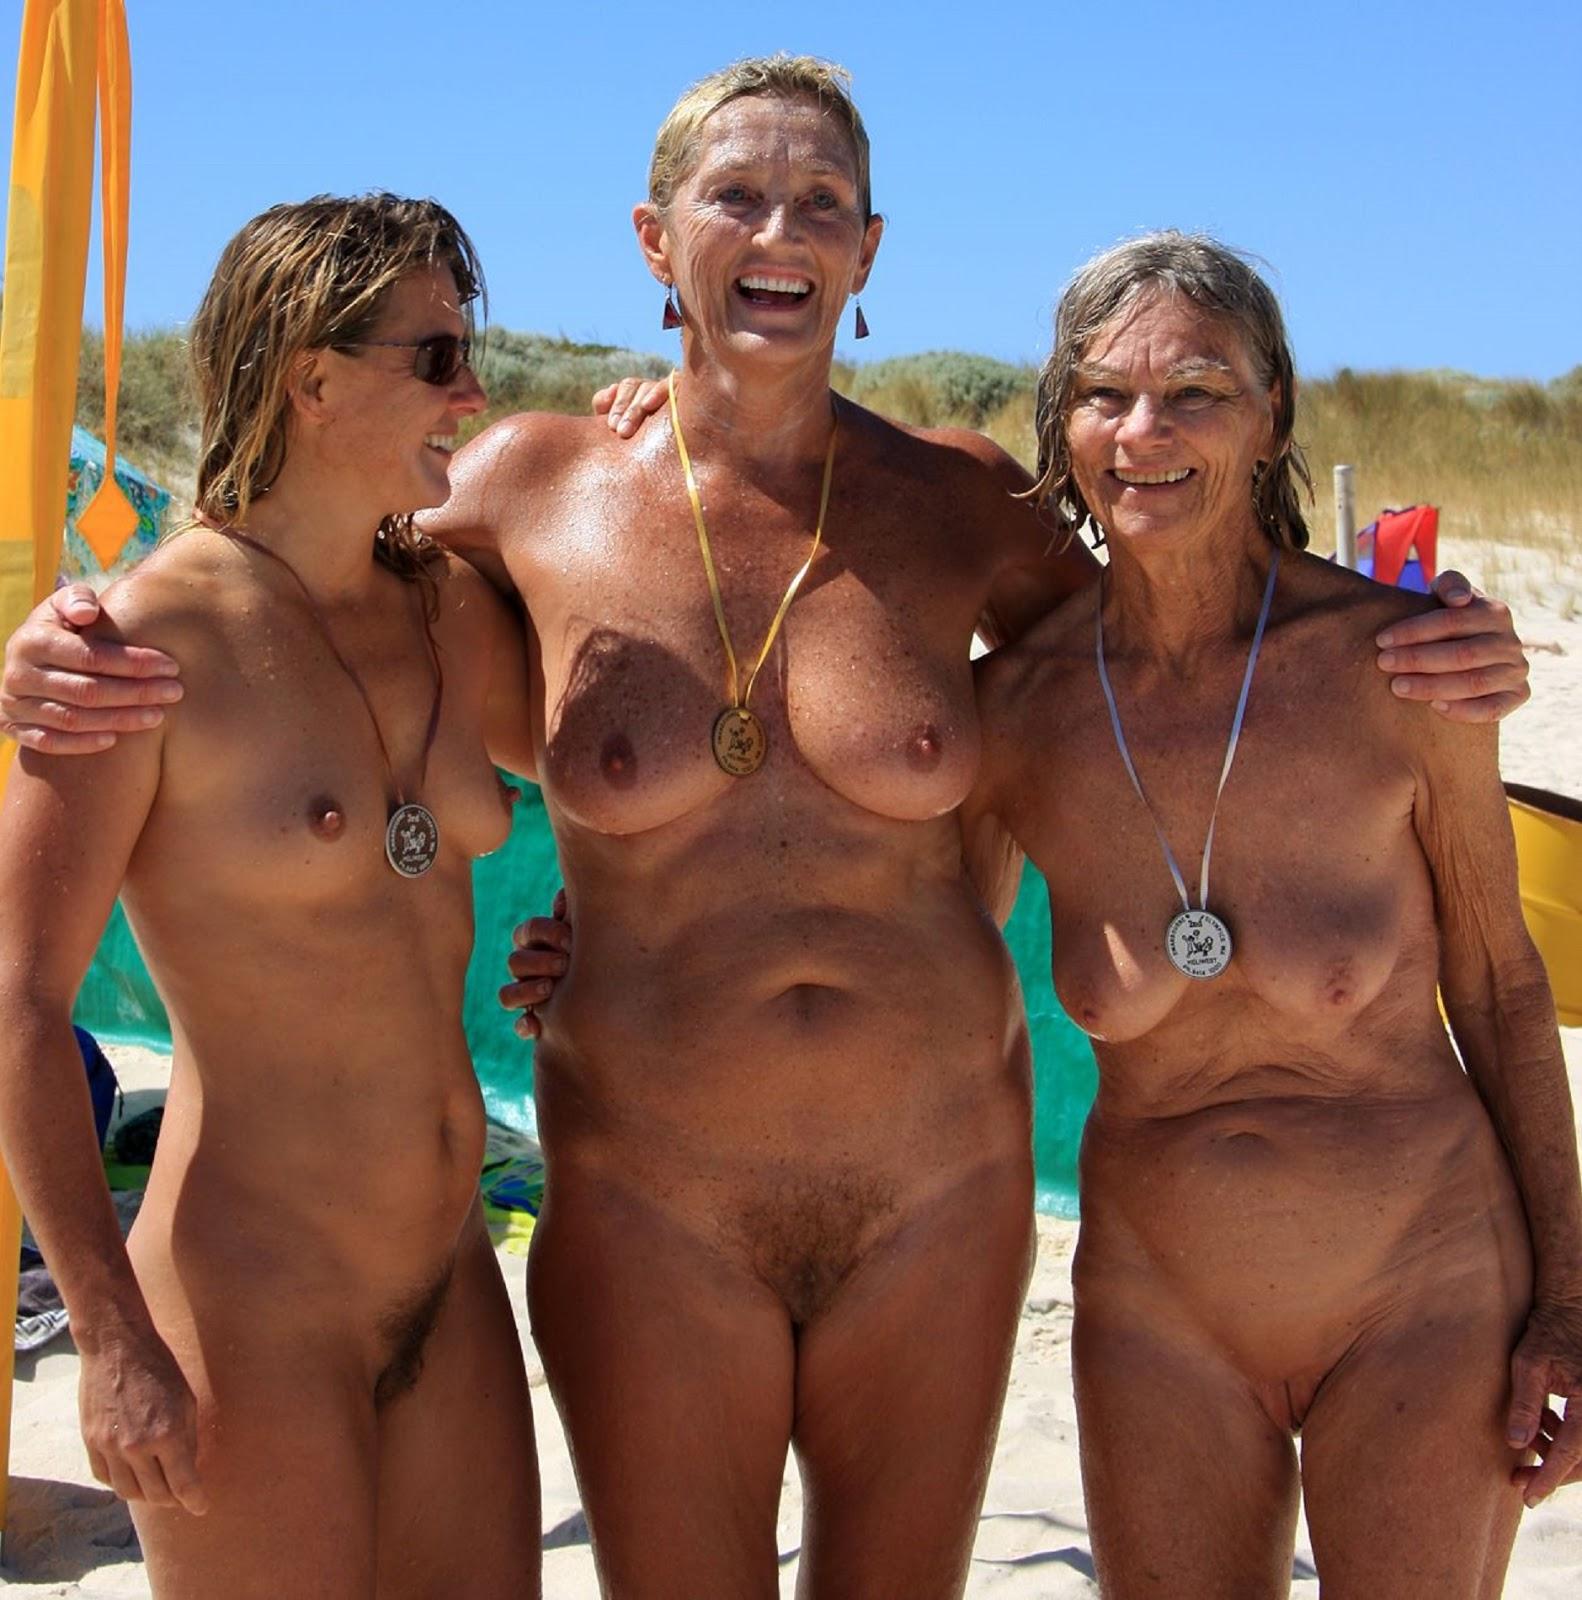 Nude Olympics  Hot Girl Hd Wallpaper-7082